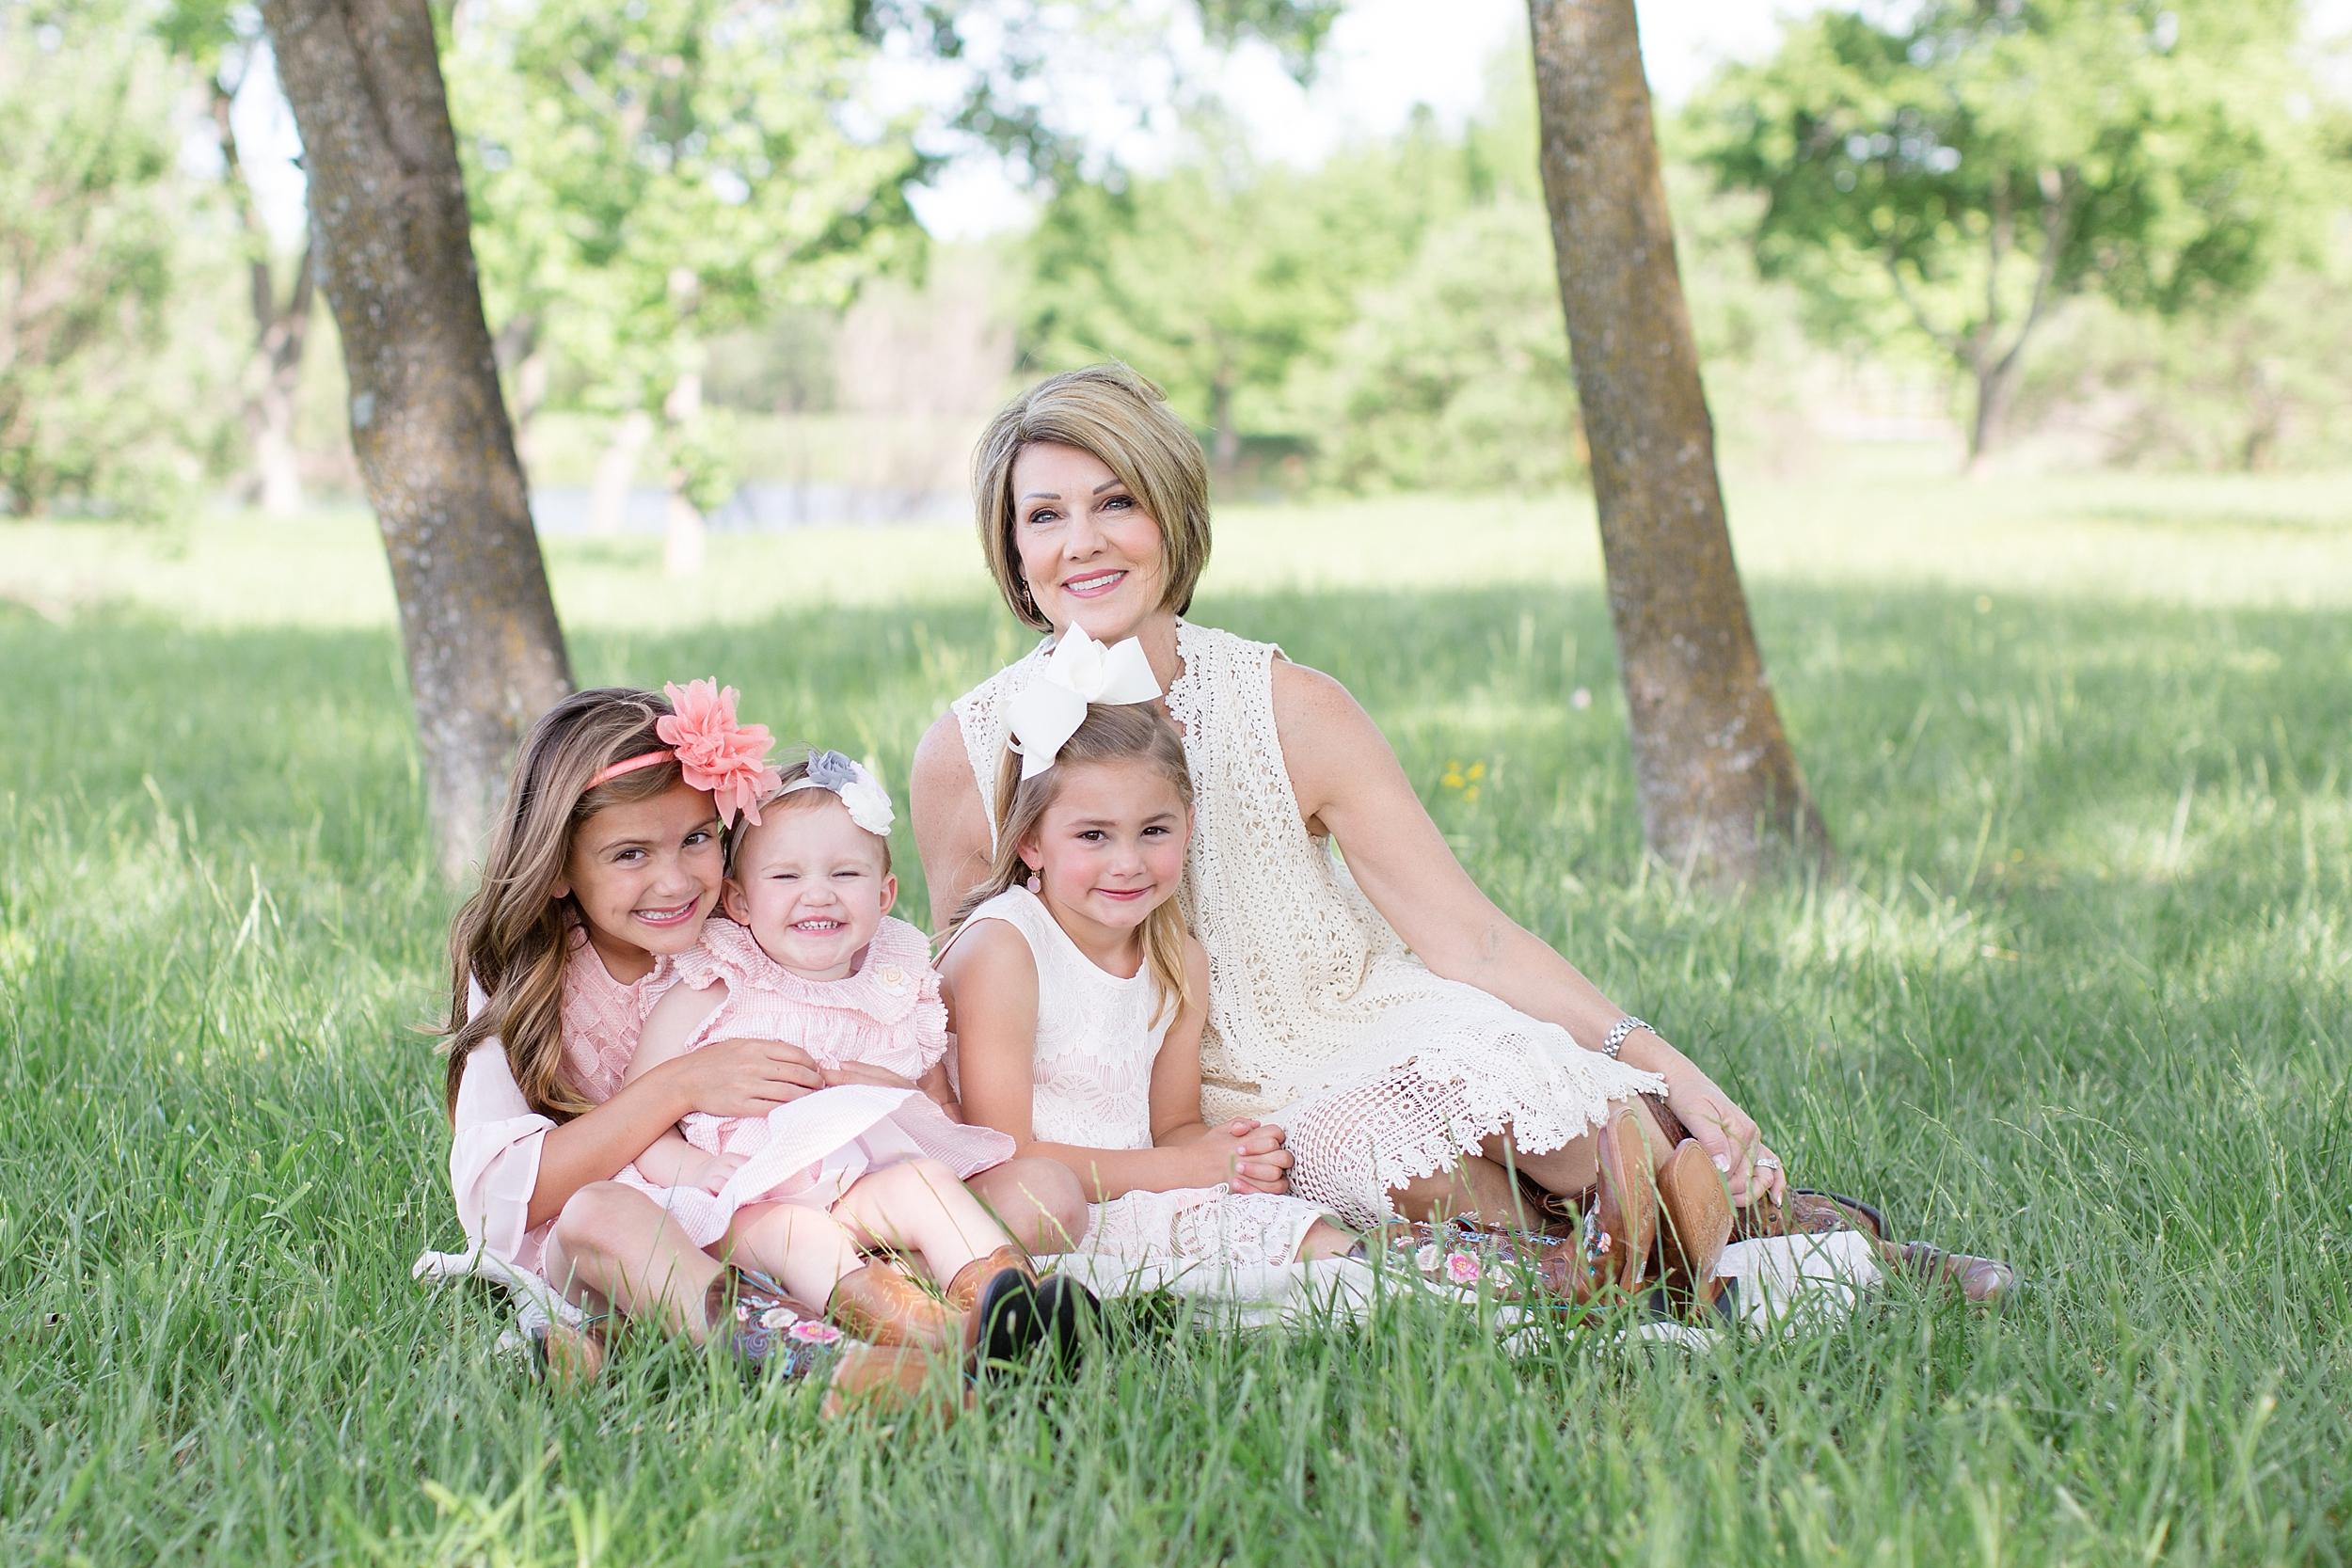 Landon-Schneider-Photography-Family-Session-Texas_0006.jpg